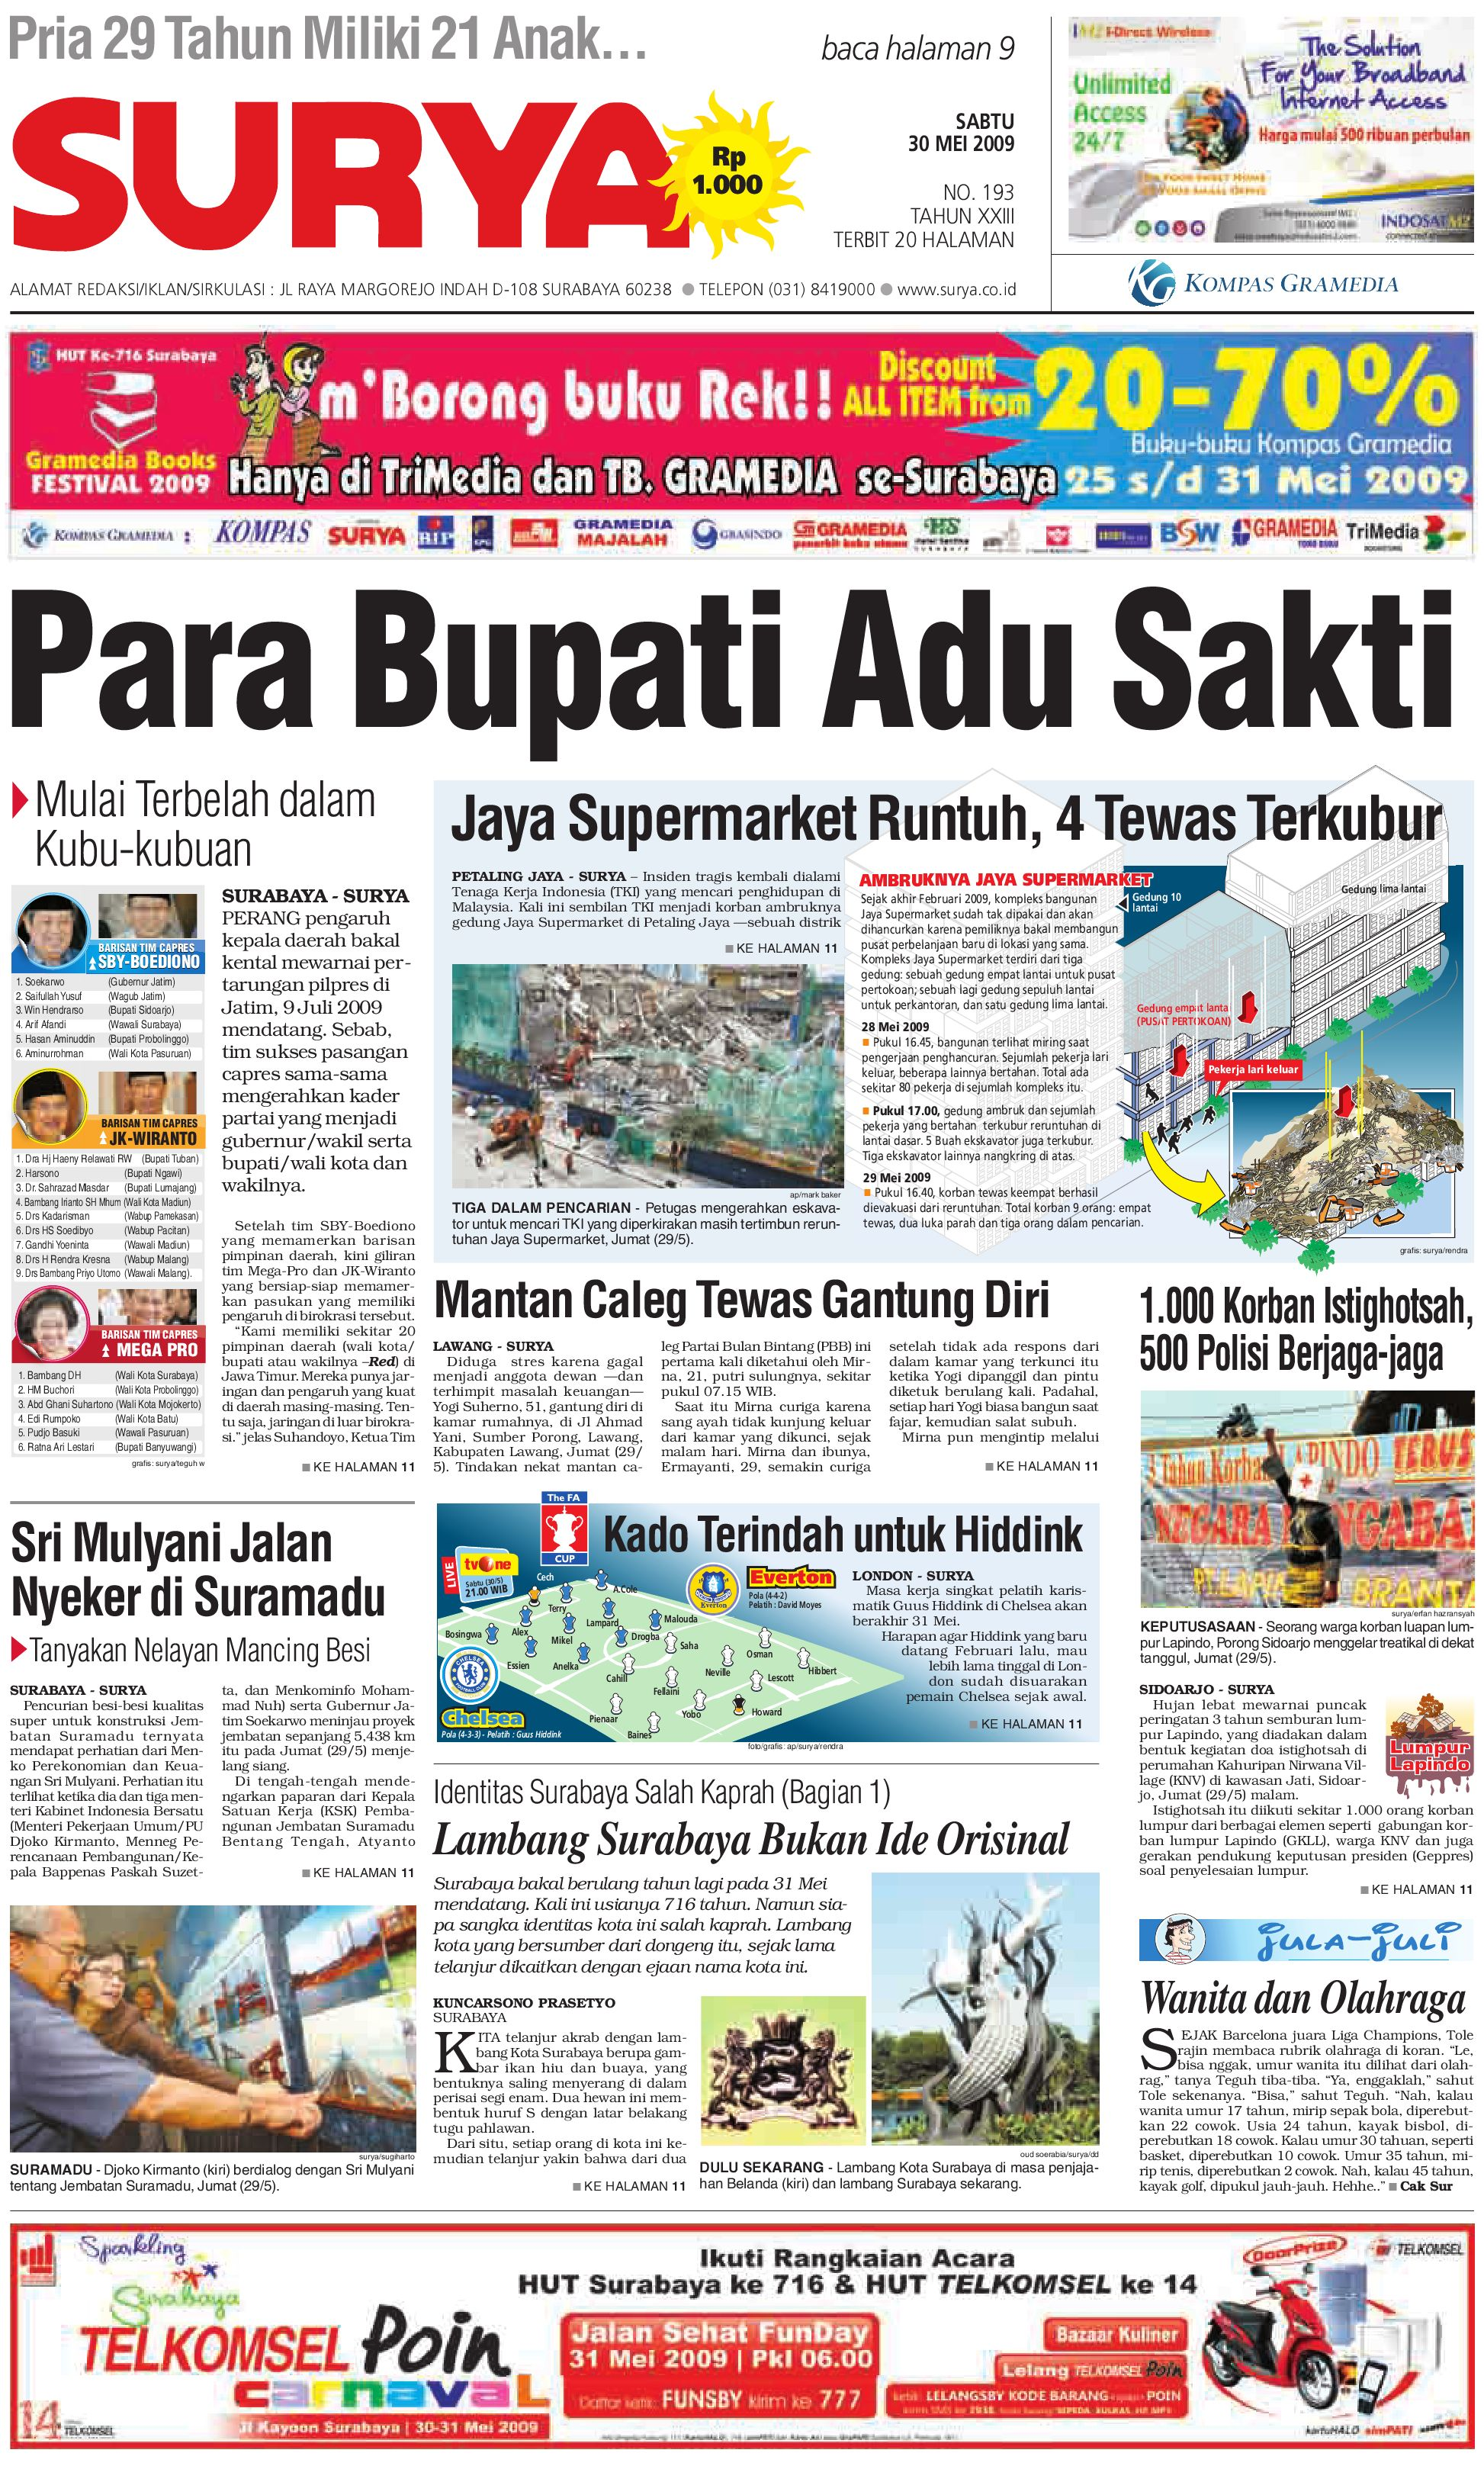 Surya Edisi Cetak 30 Mei 2009 by Harian SURYA - issuu 7149f131b9